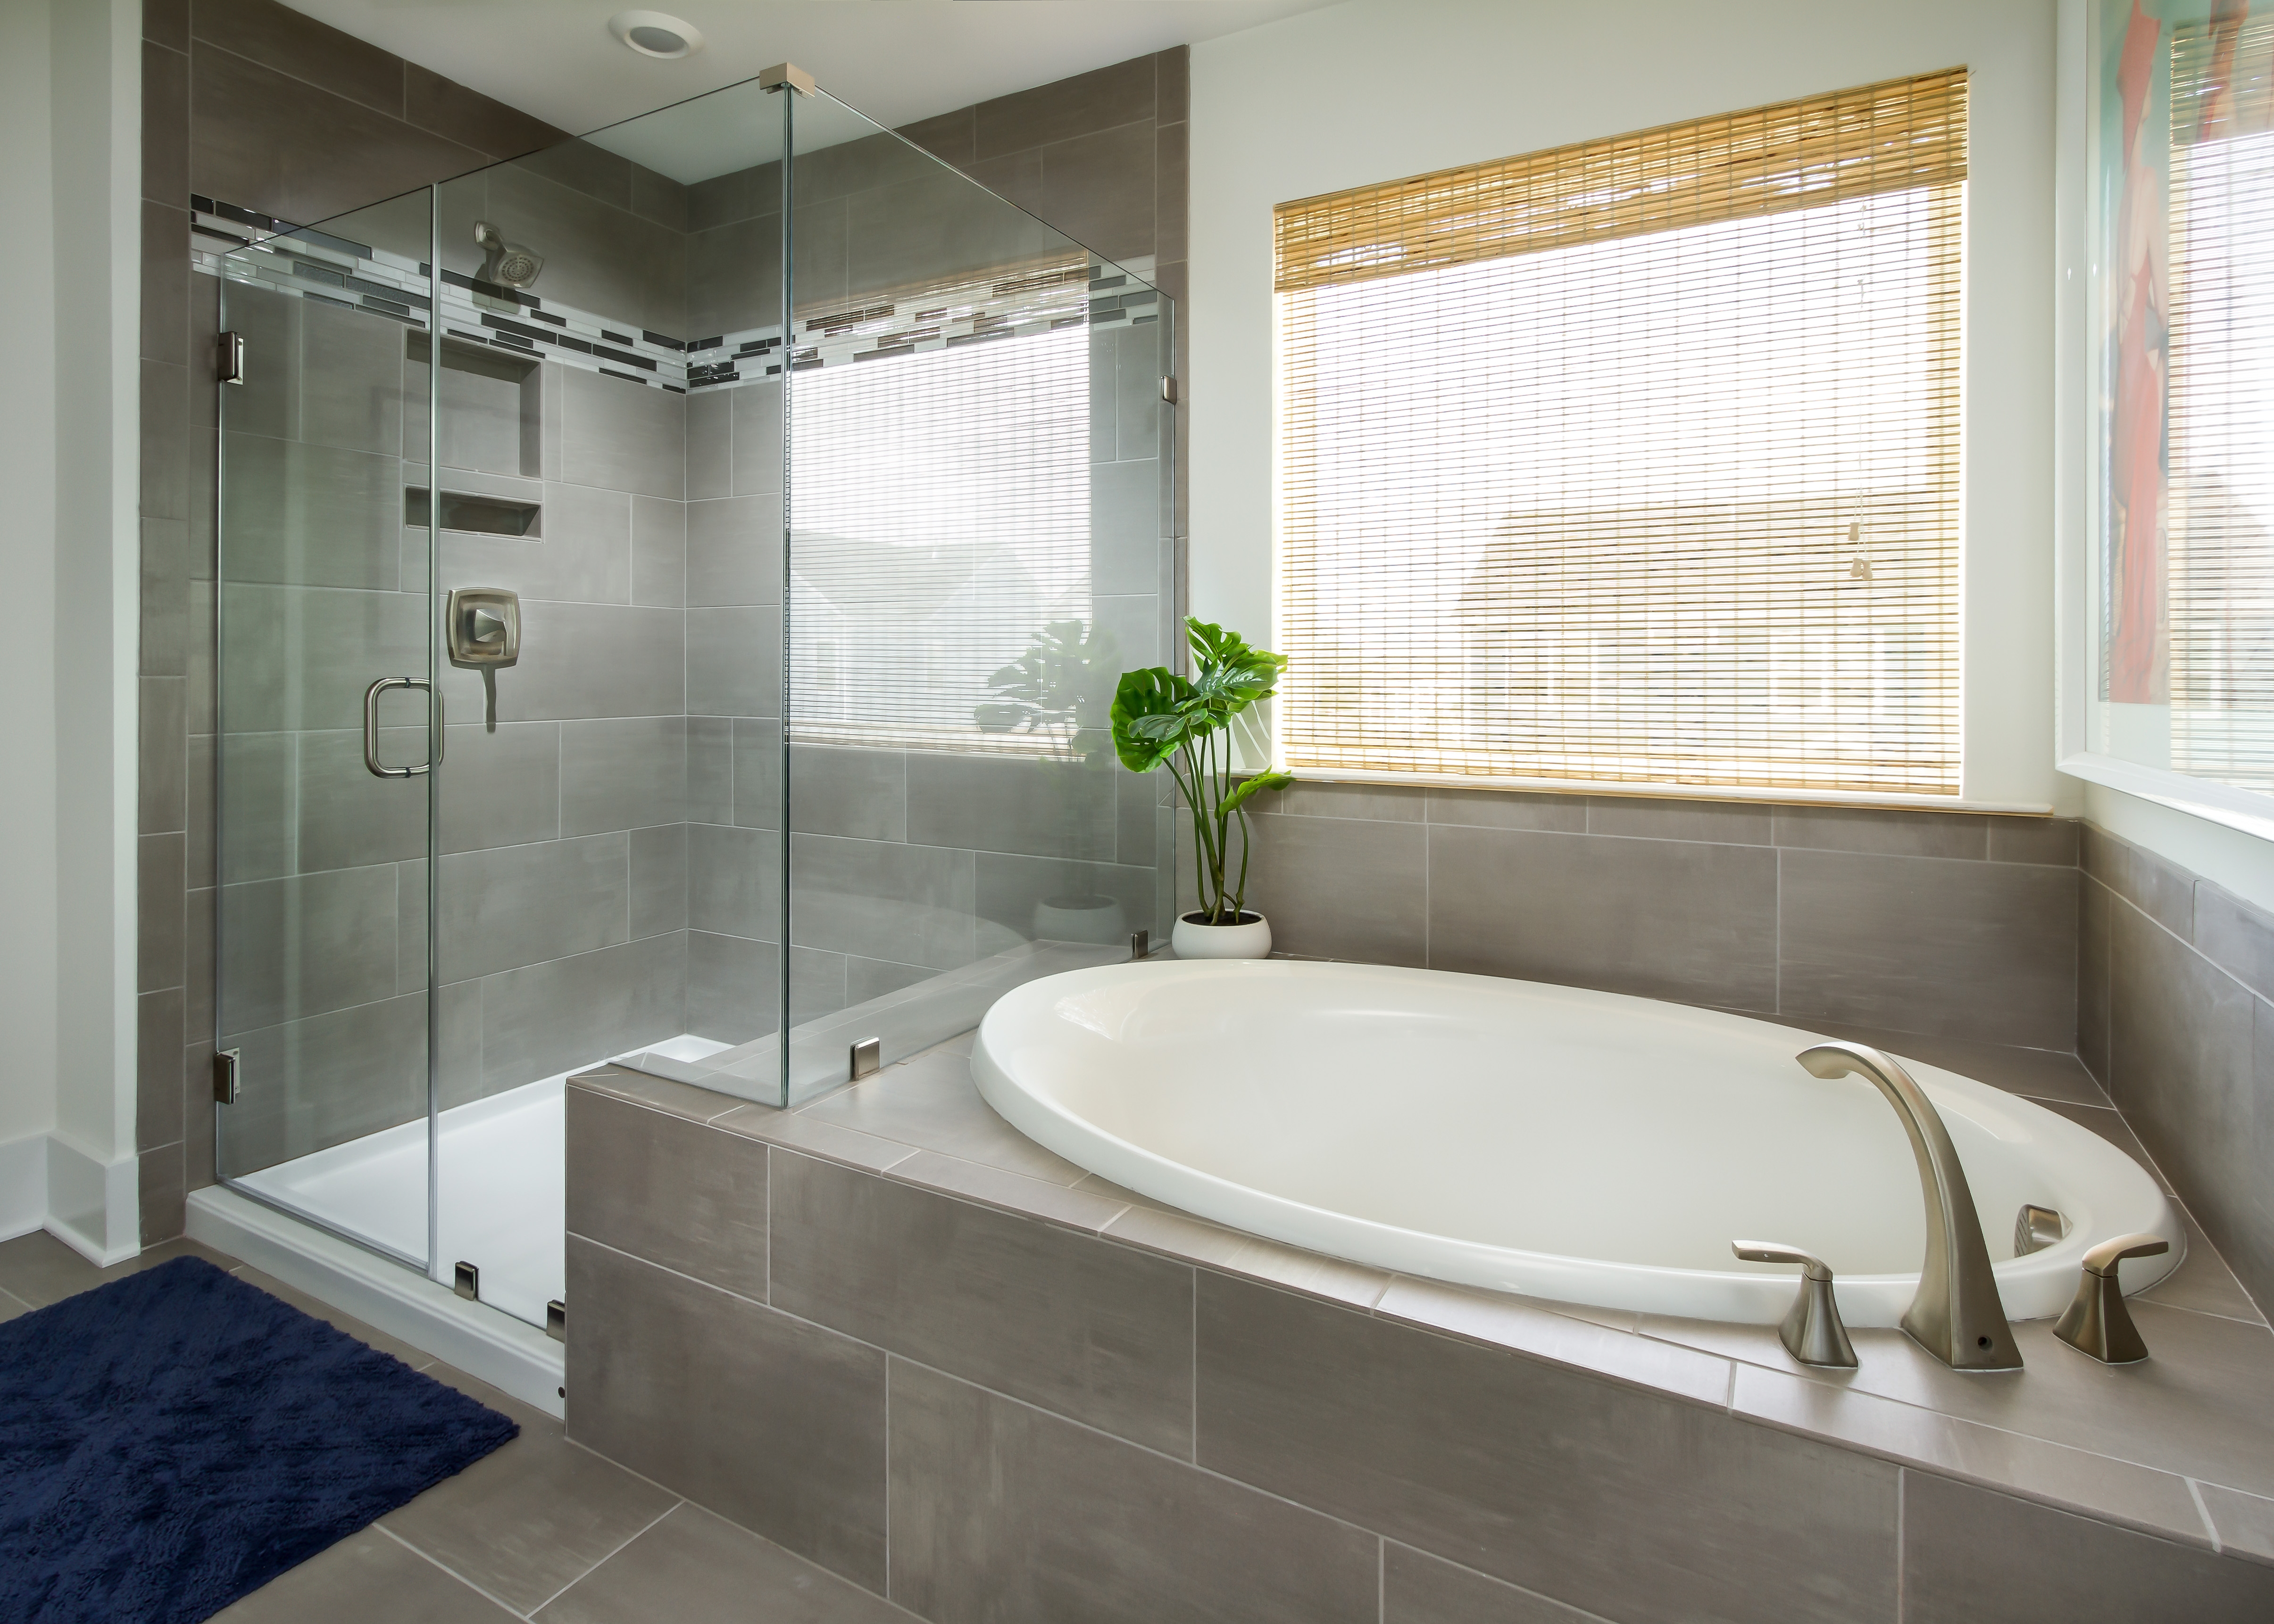 Cosgrove Owner's Bath